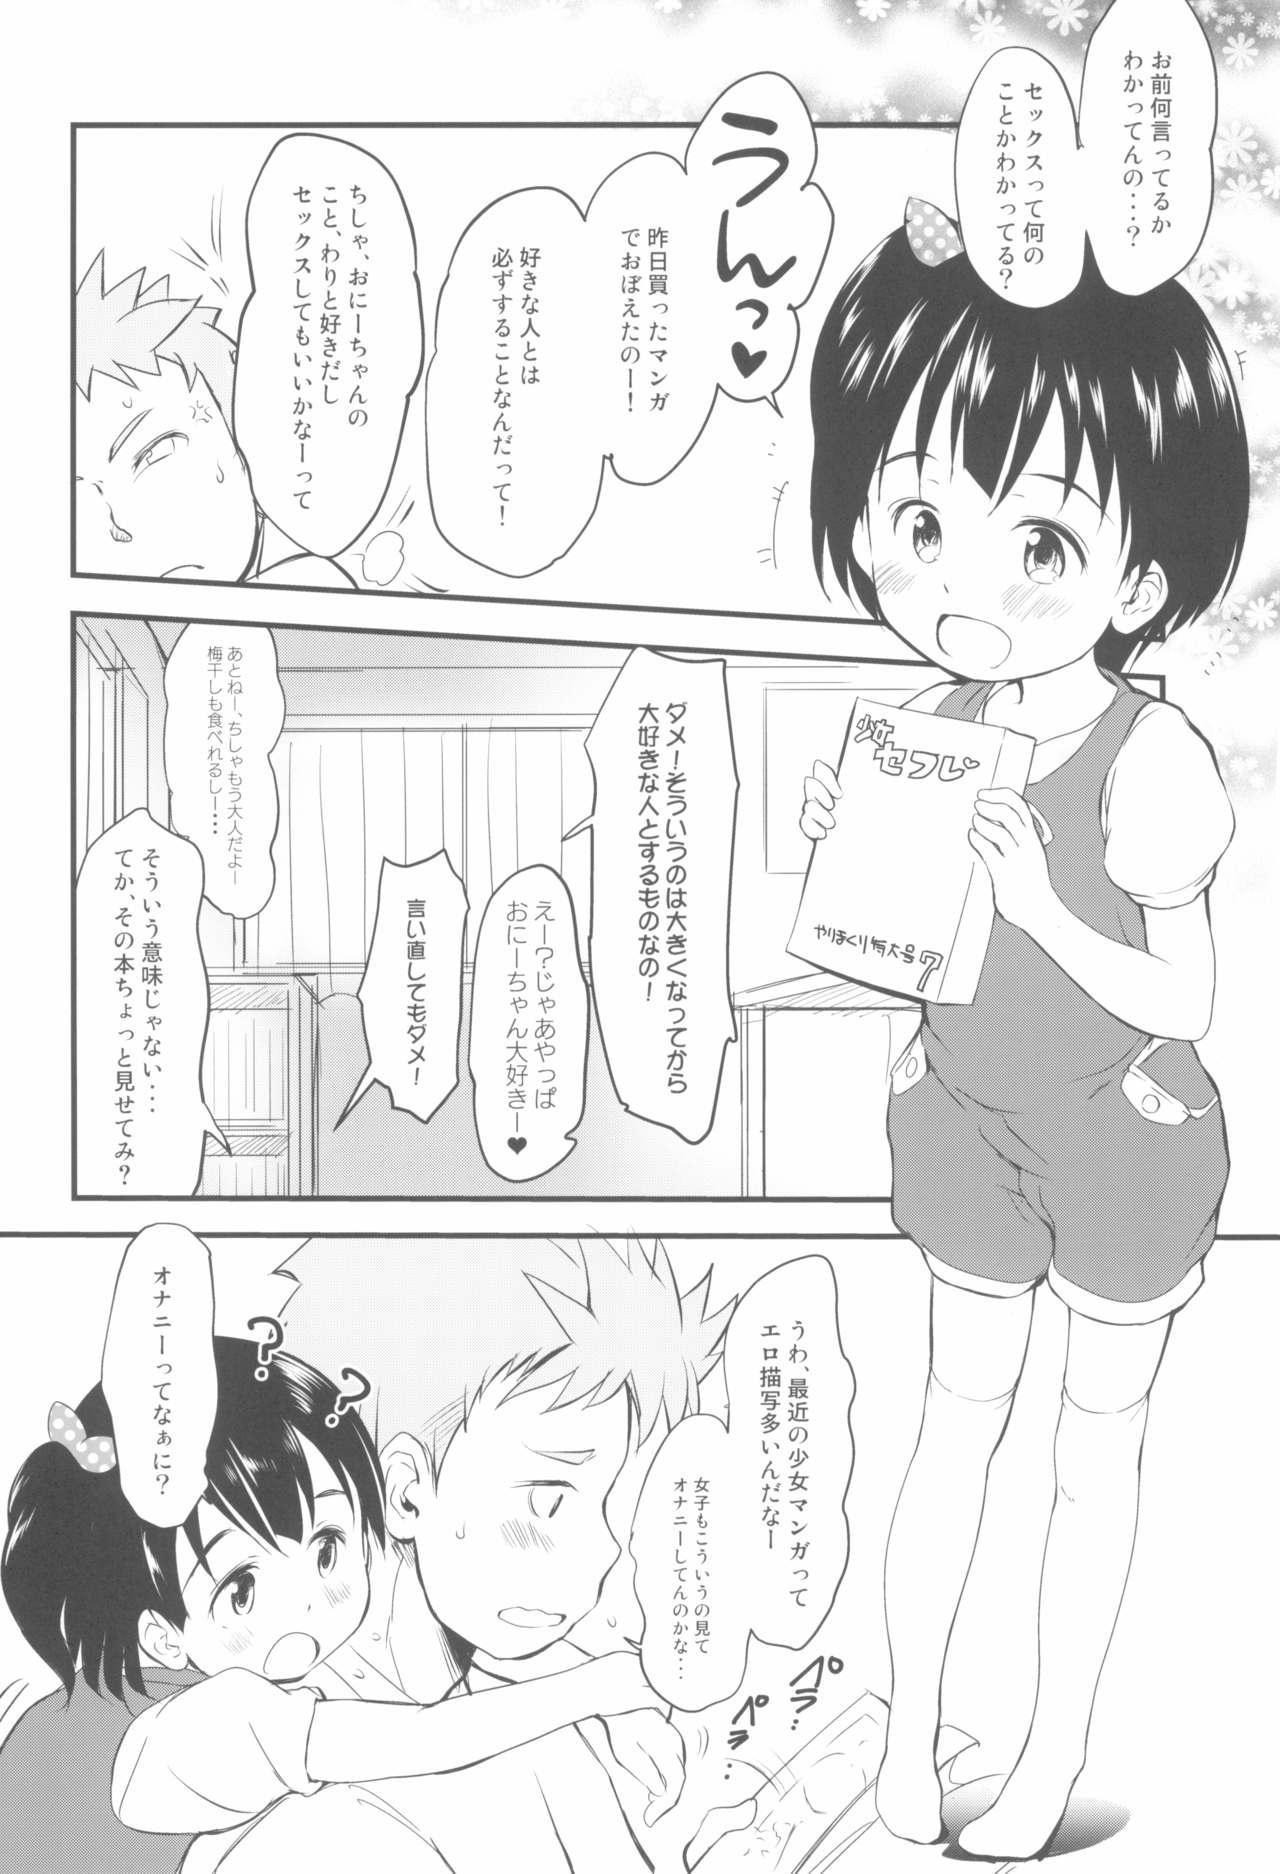 (C97) [Wancho-ke (Wancho)] Imouto wa Minna Onii-chan ga Suki! 5-Kaiteiban- 5